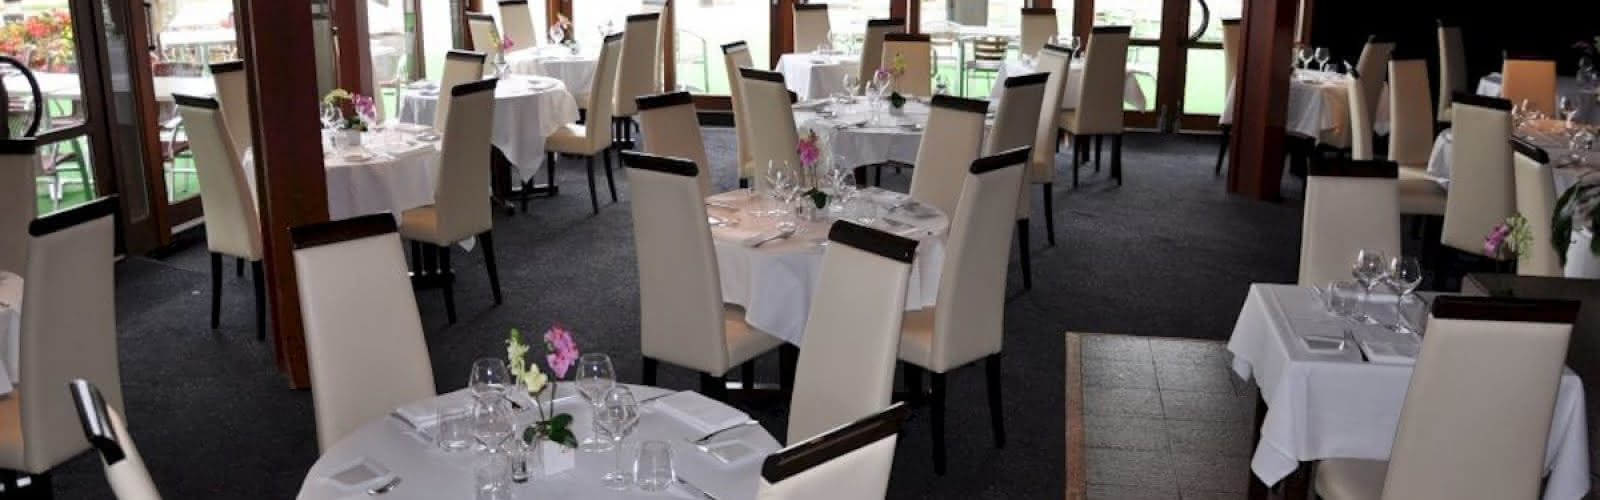 Restaurant des Lacs